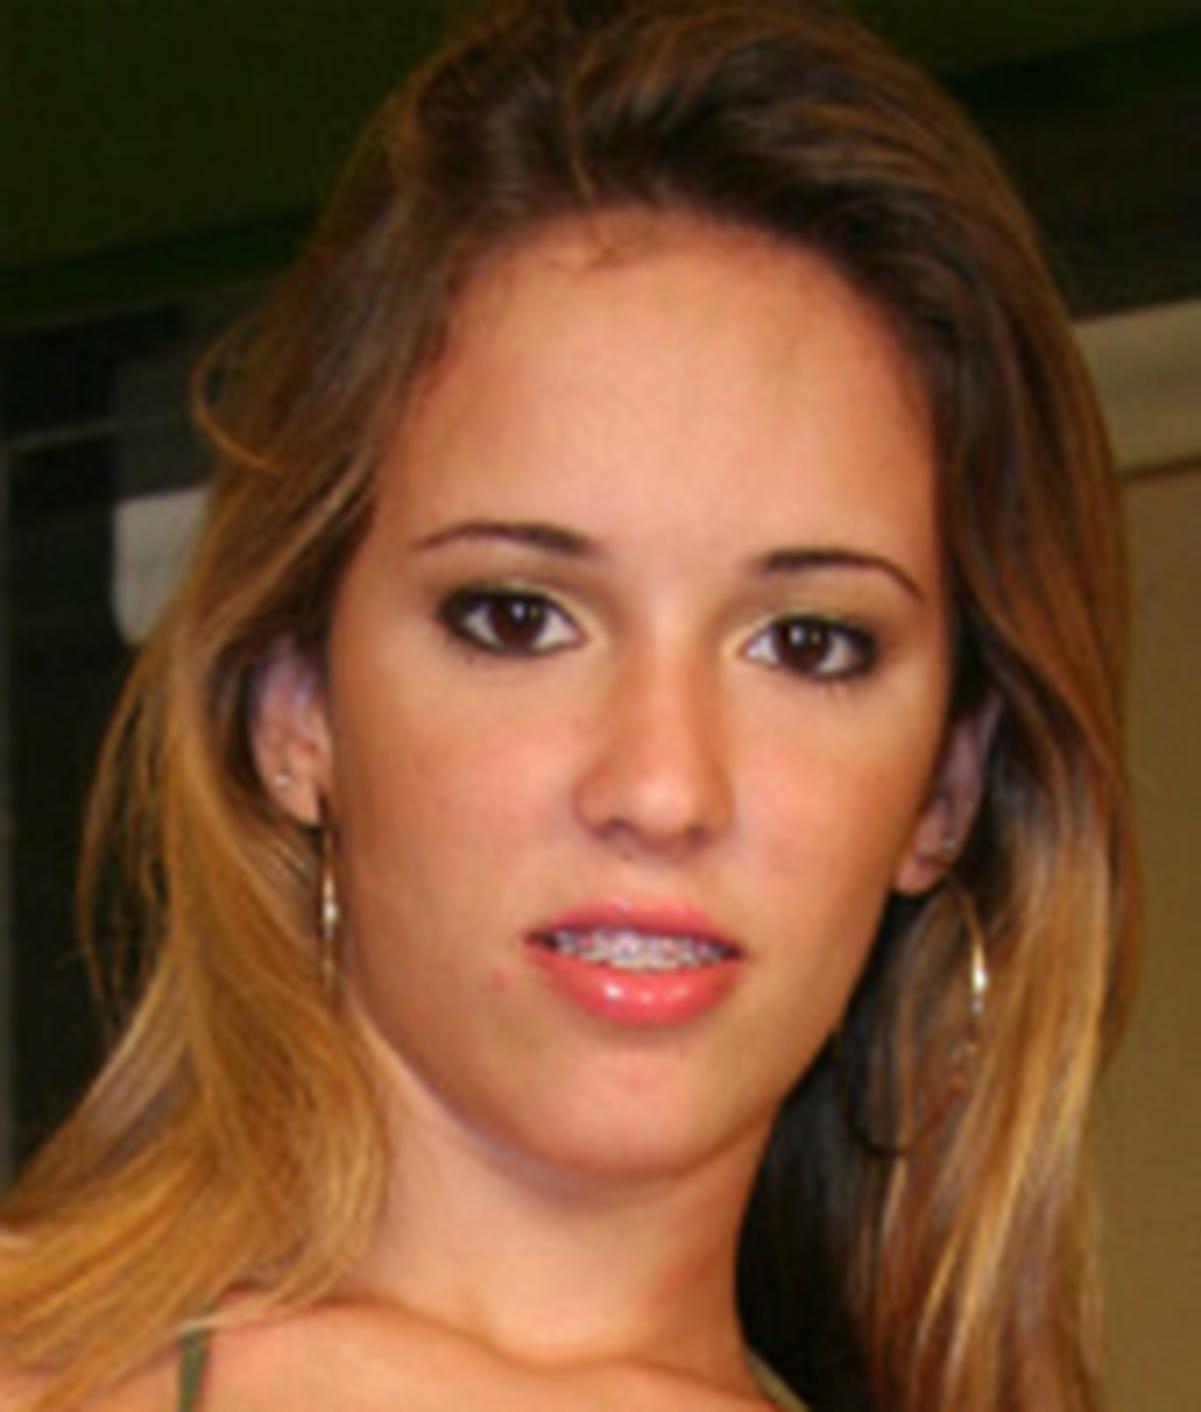 Gisele Prado wiki, Gisele Prado bio, Gisele Prado news